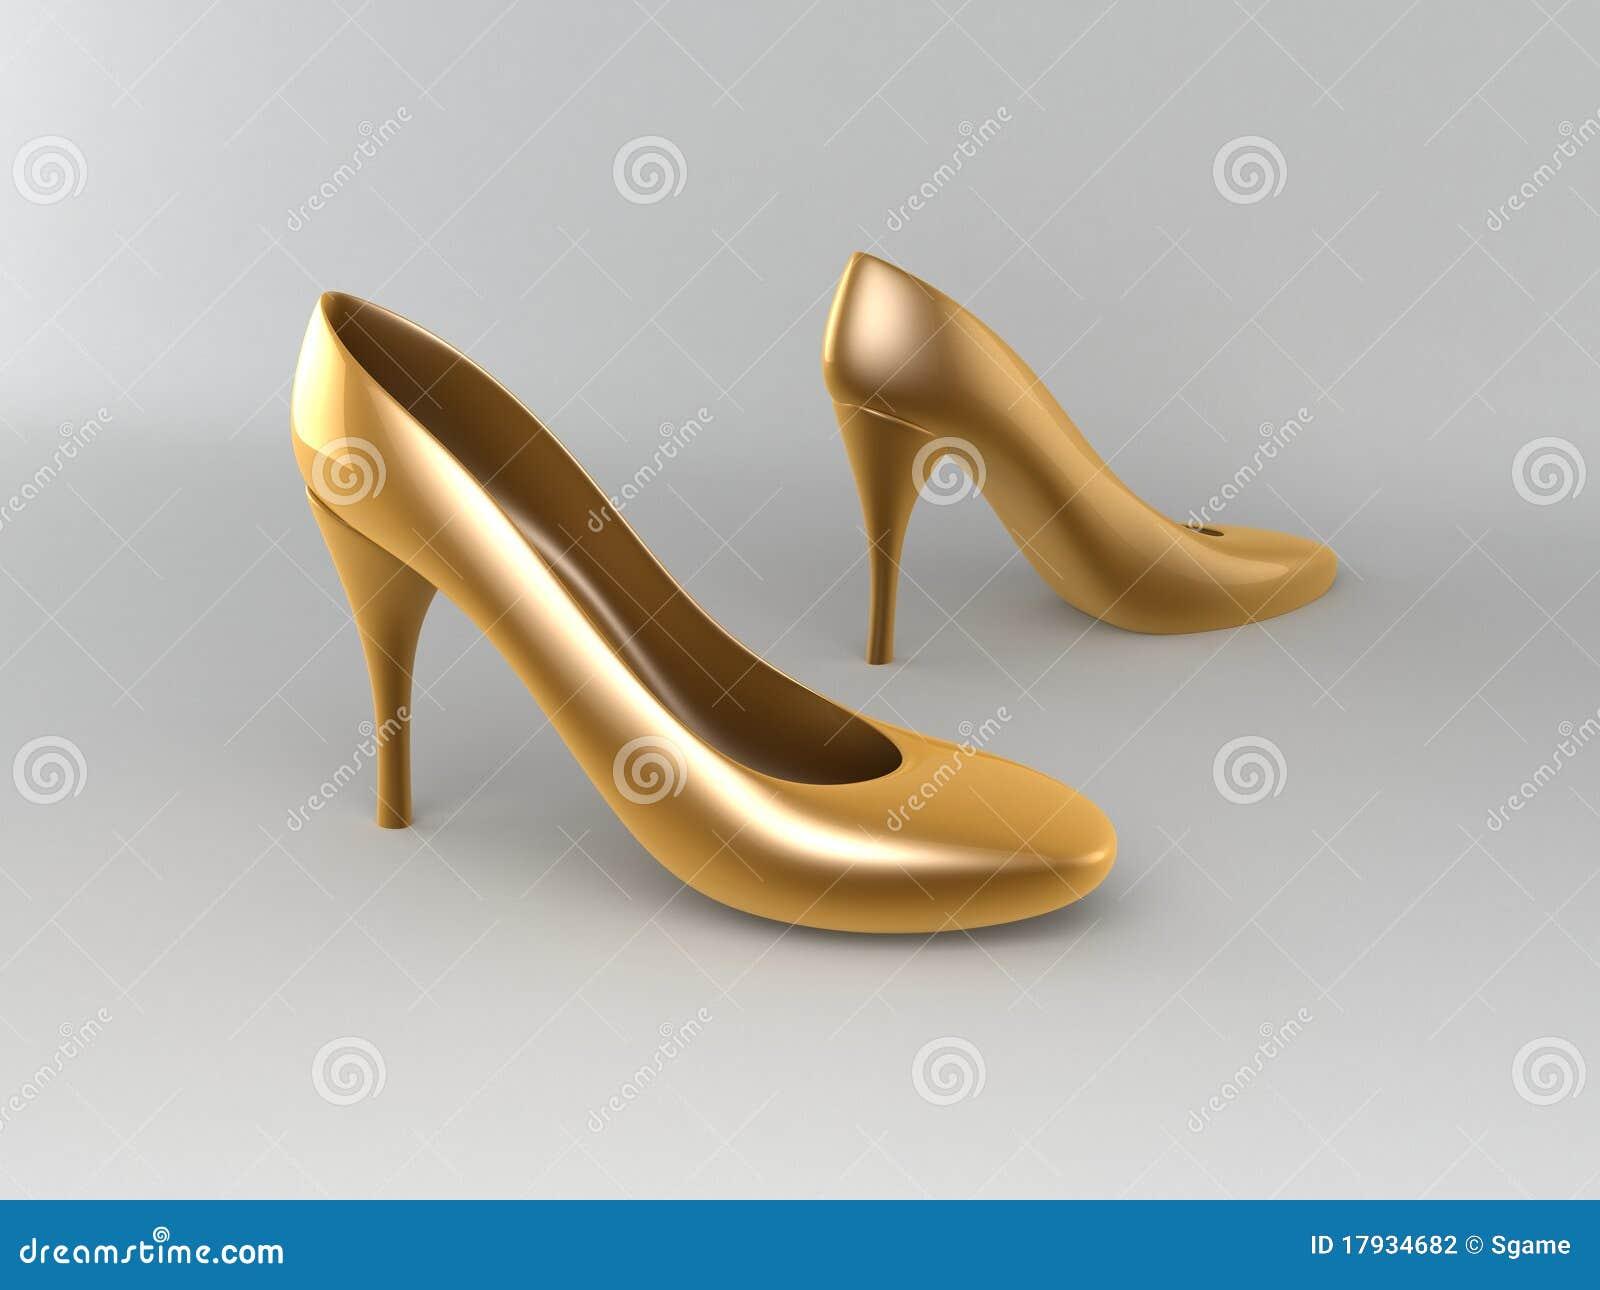 golden high heeled shoes stock photography image 17934682. Black Bedroom Furniture Sets. Home Design Ideas